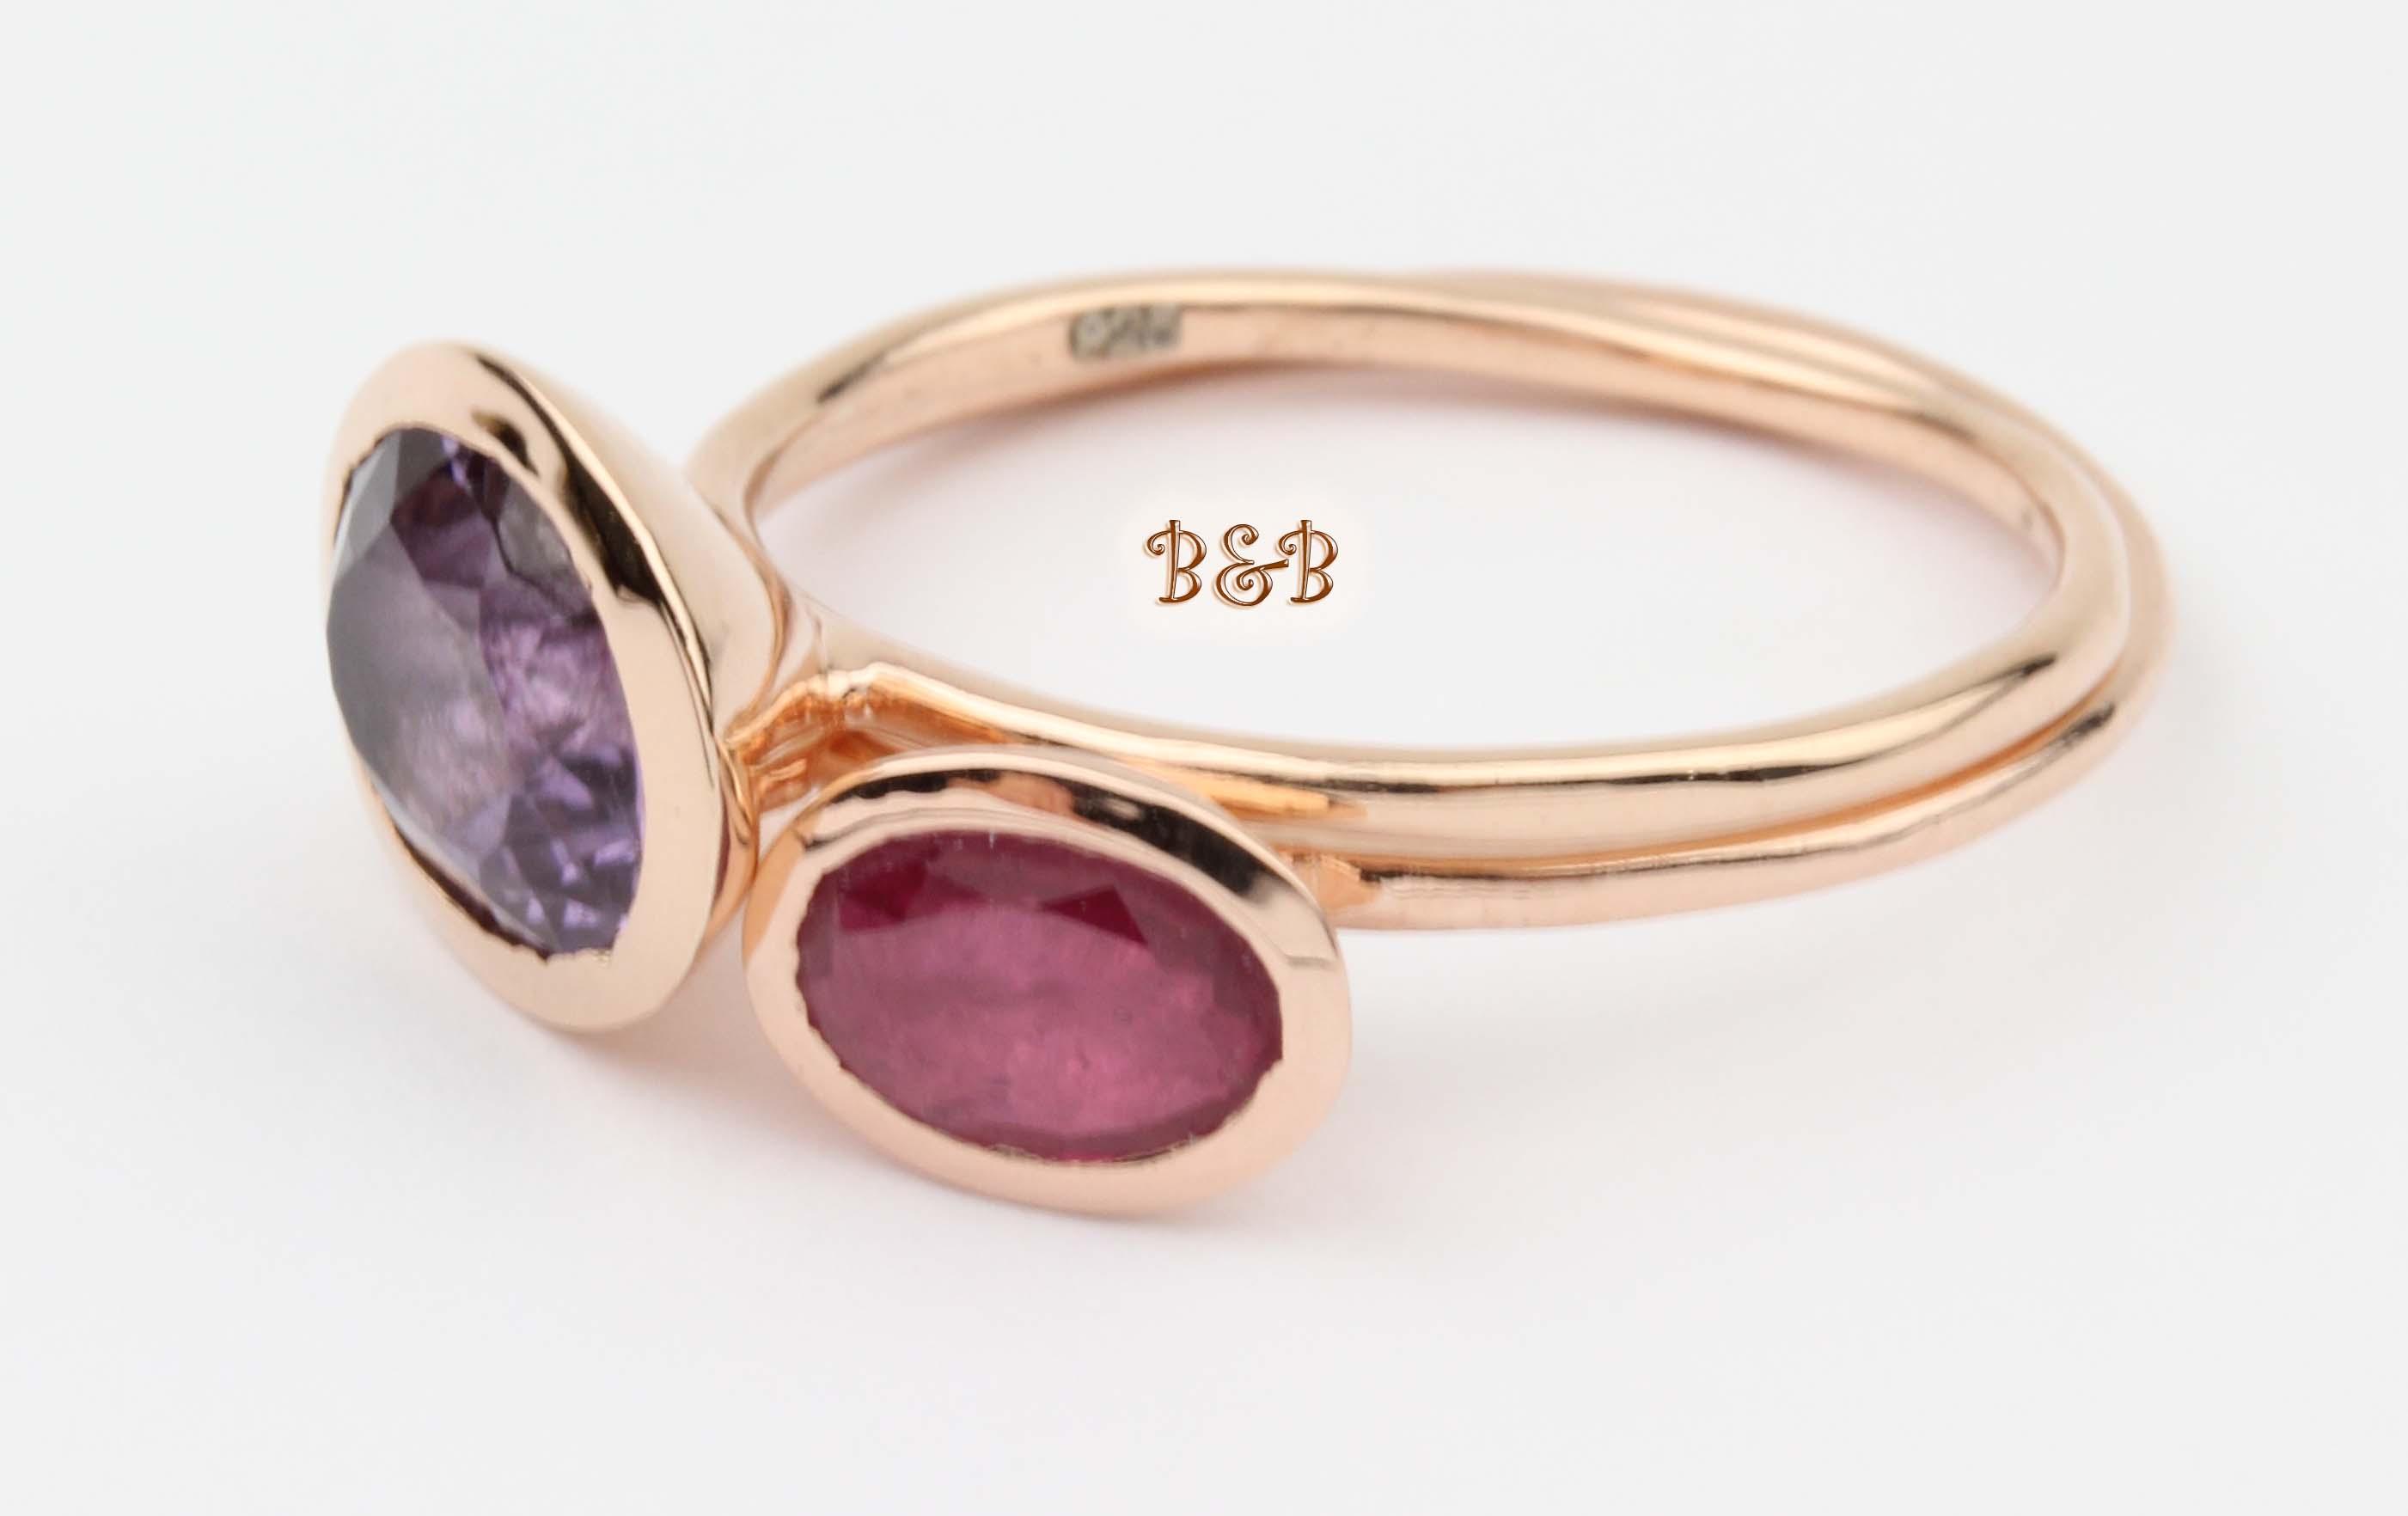 Silver ring_B&B_1858